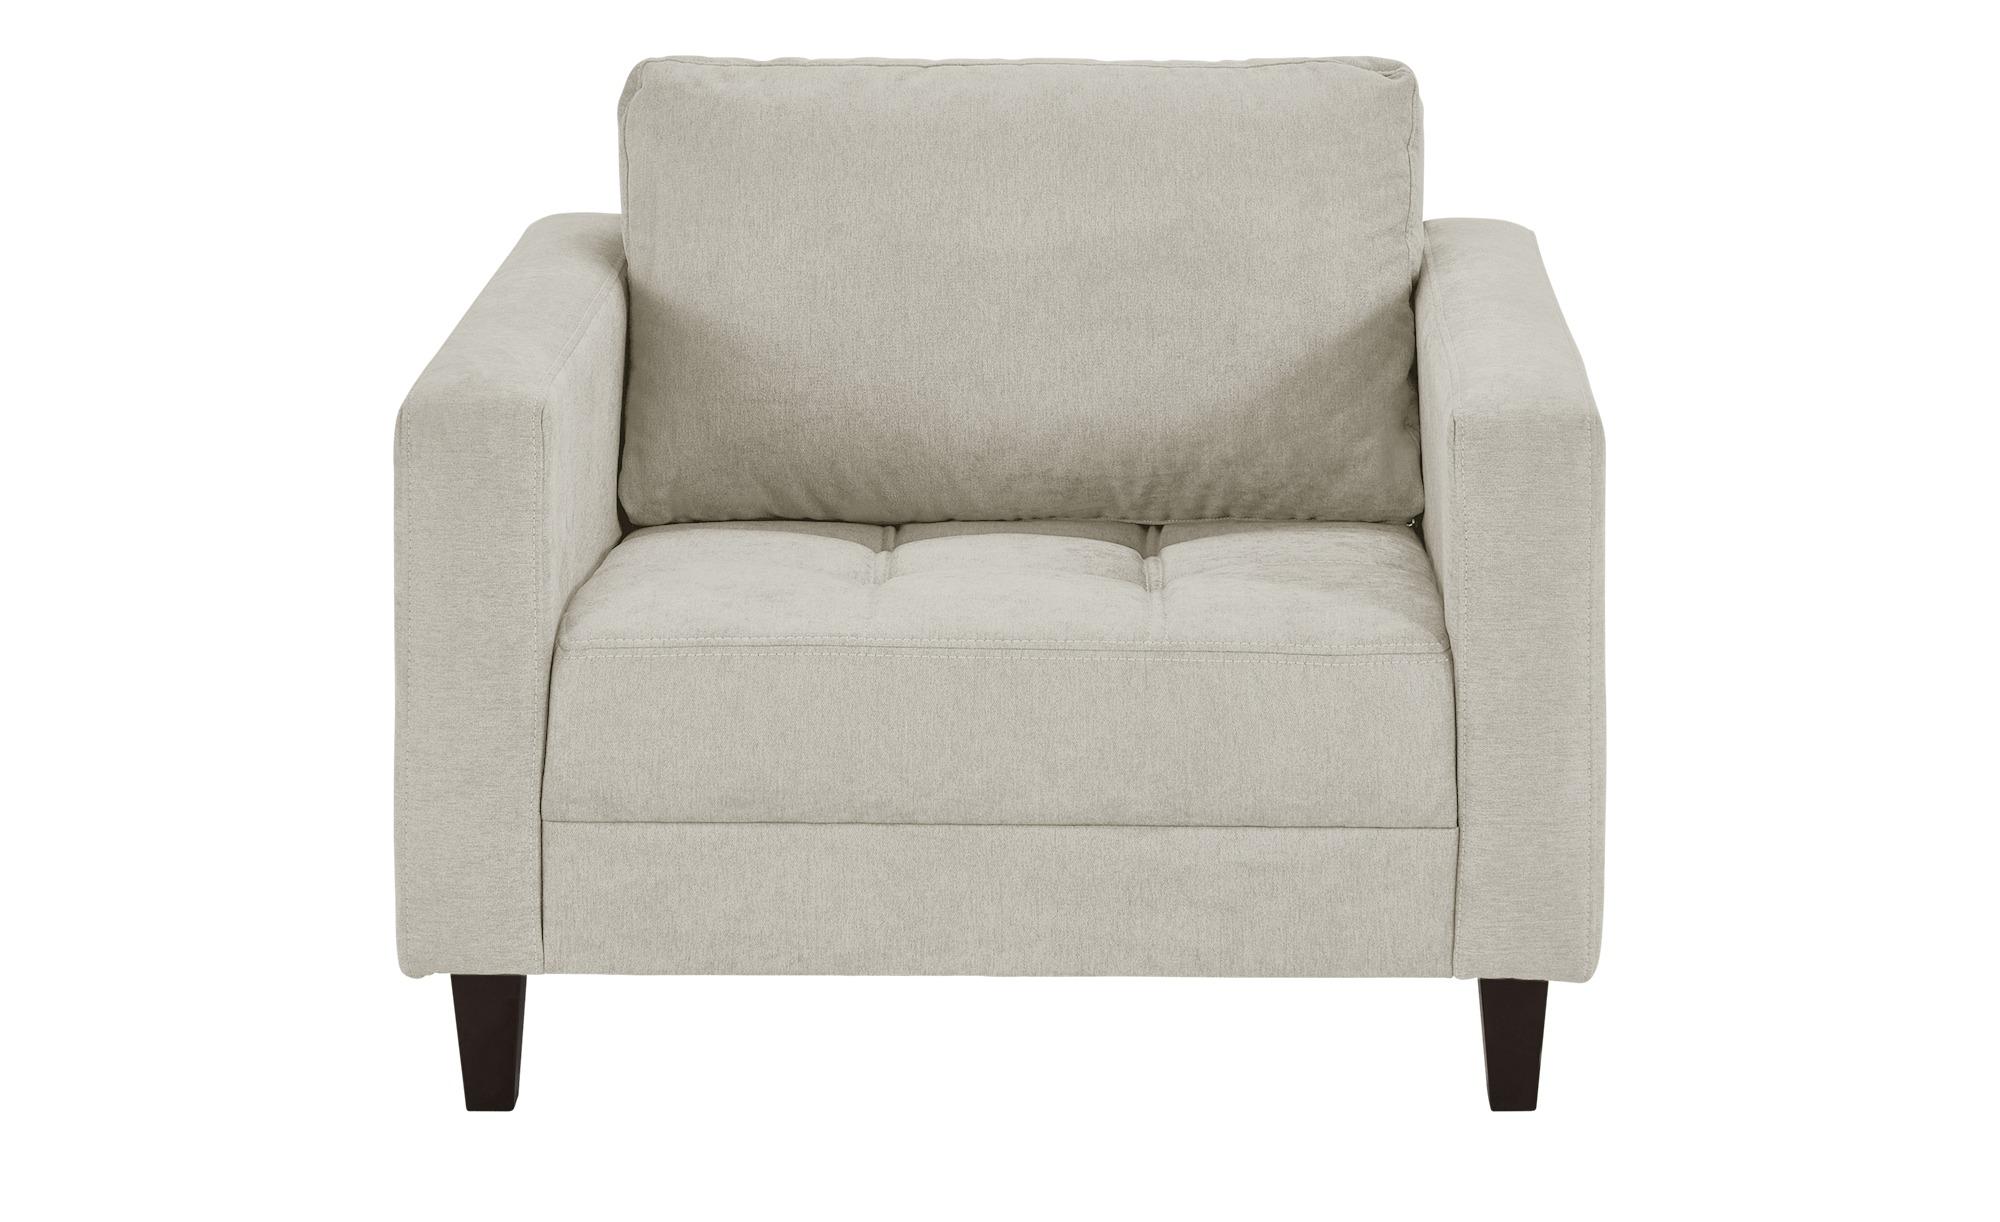 smart Sessel weiß - Stoff Geradine ¦ weiß ¦ Maße (cm): B: 102 H: 83 T: 91 Polstermöbel > Sessel > Polstersessel - Höffner